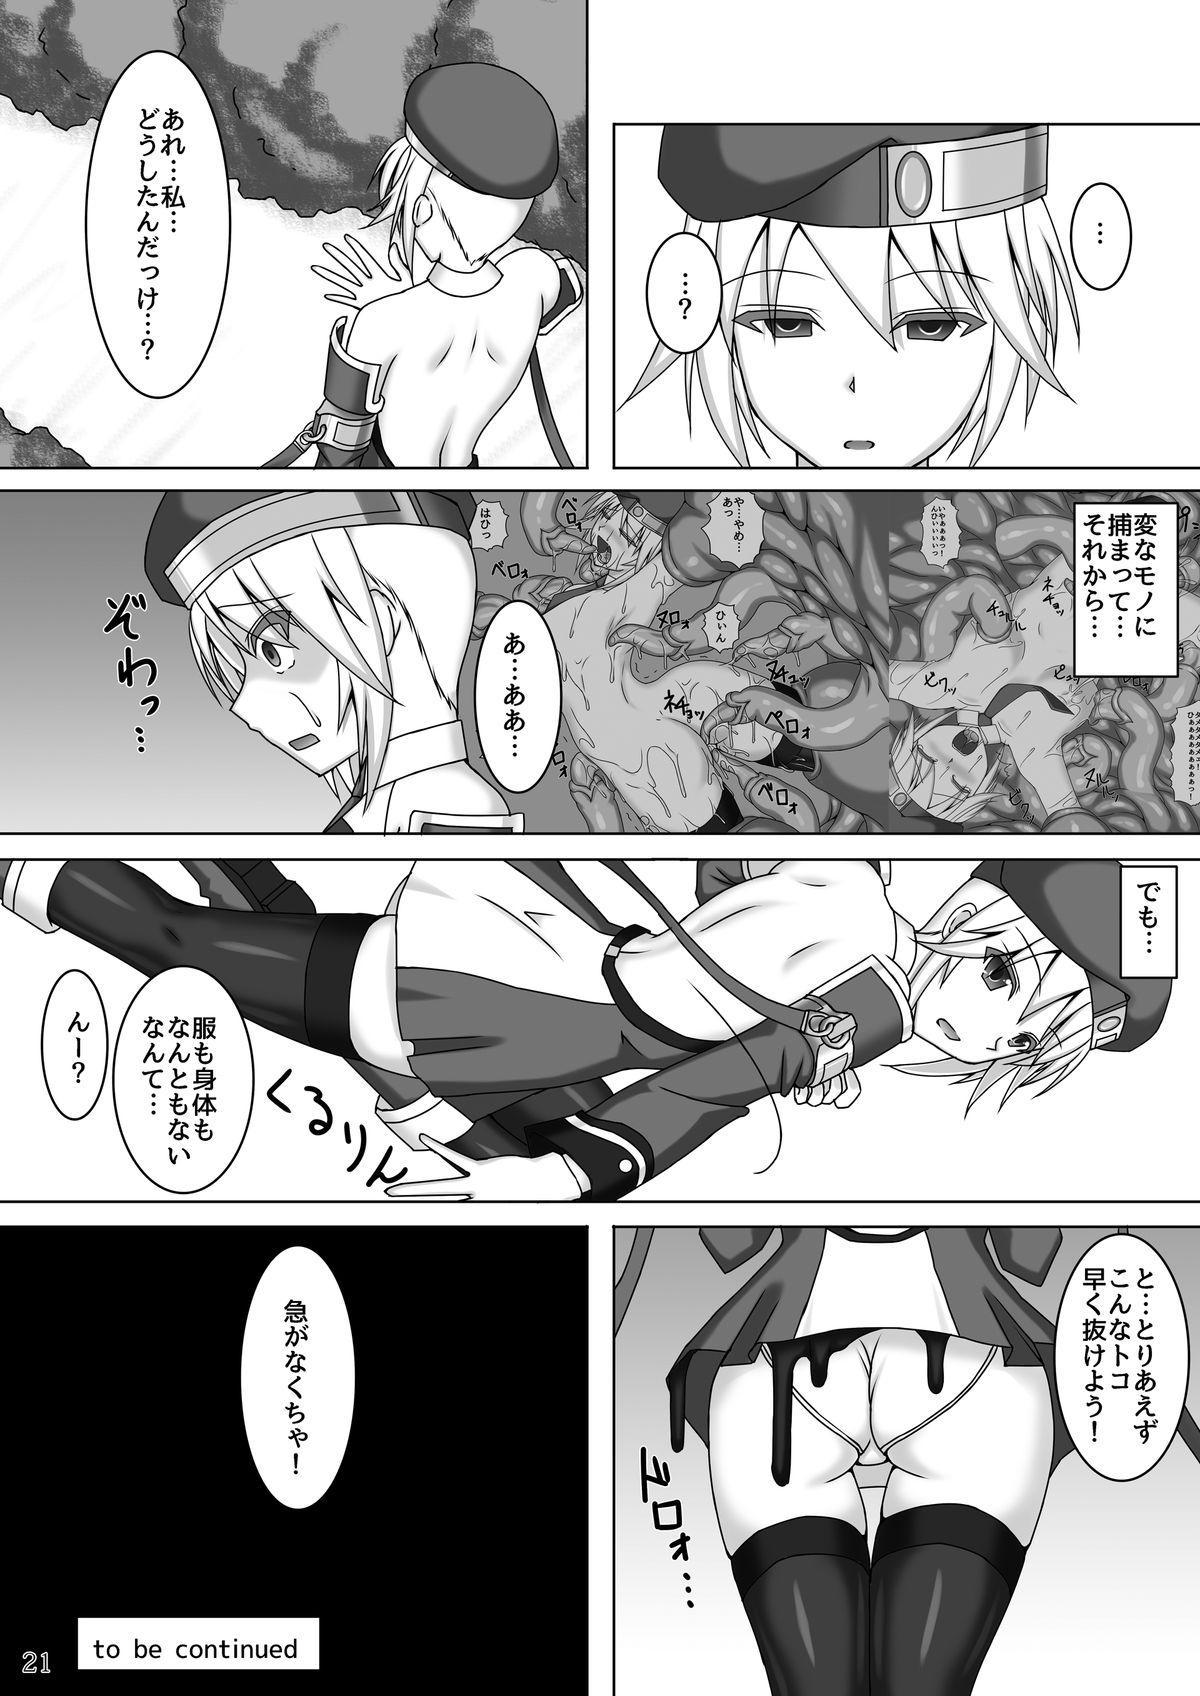 Arakune ga Kirai na Noel Nanka Imasen! 21